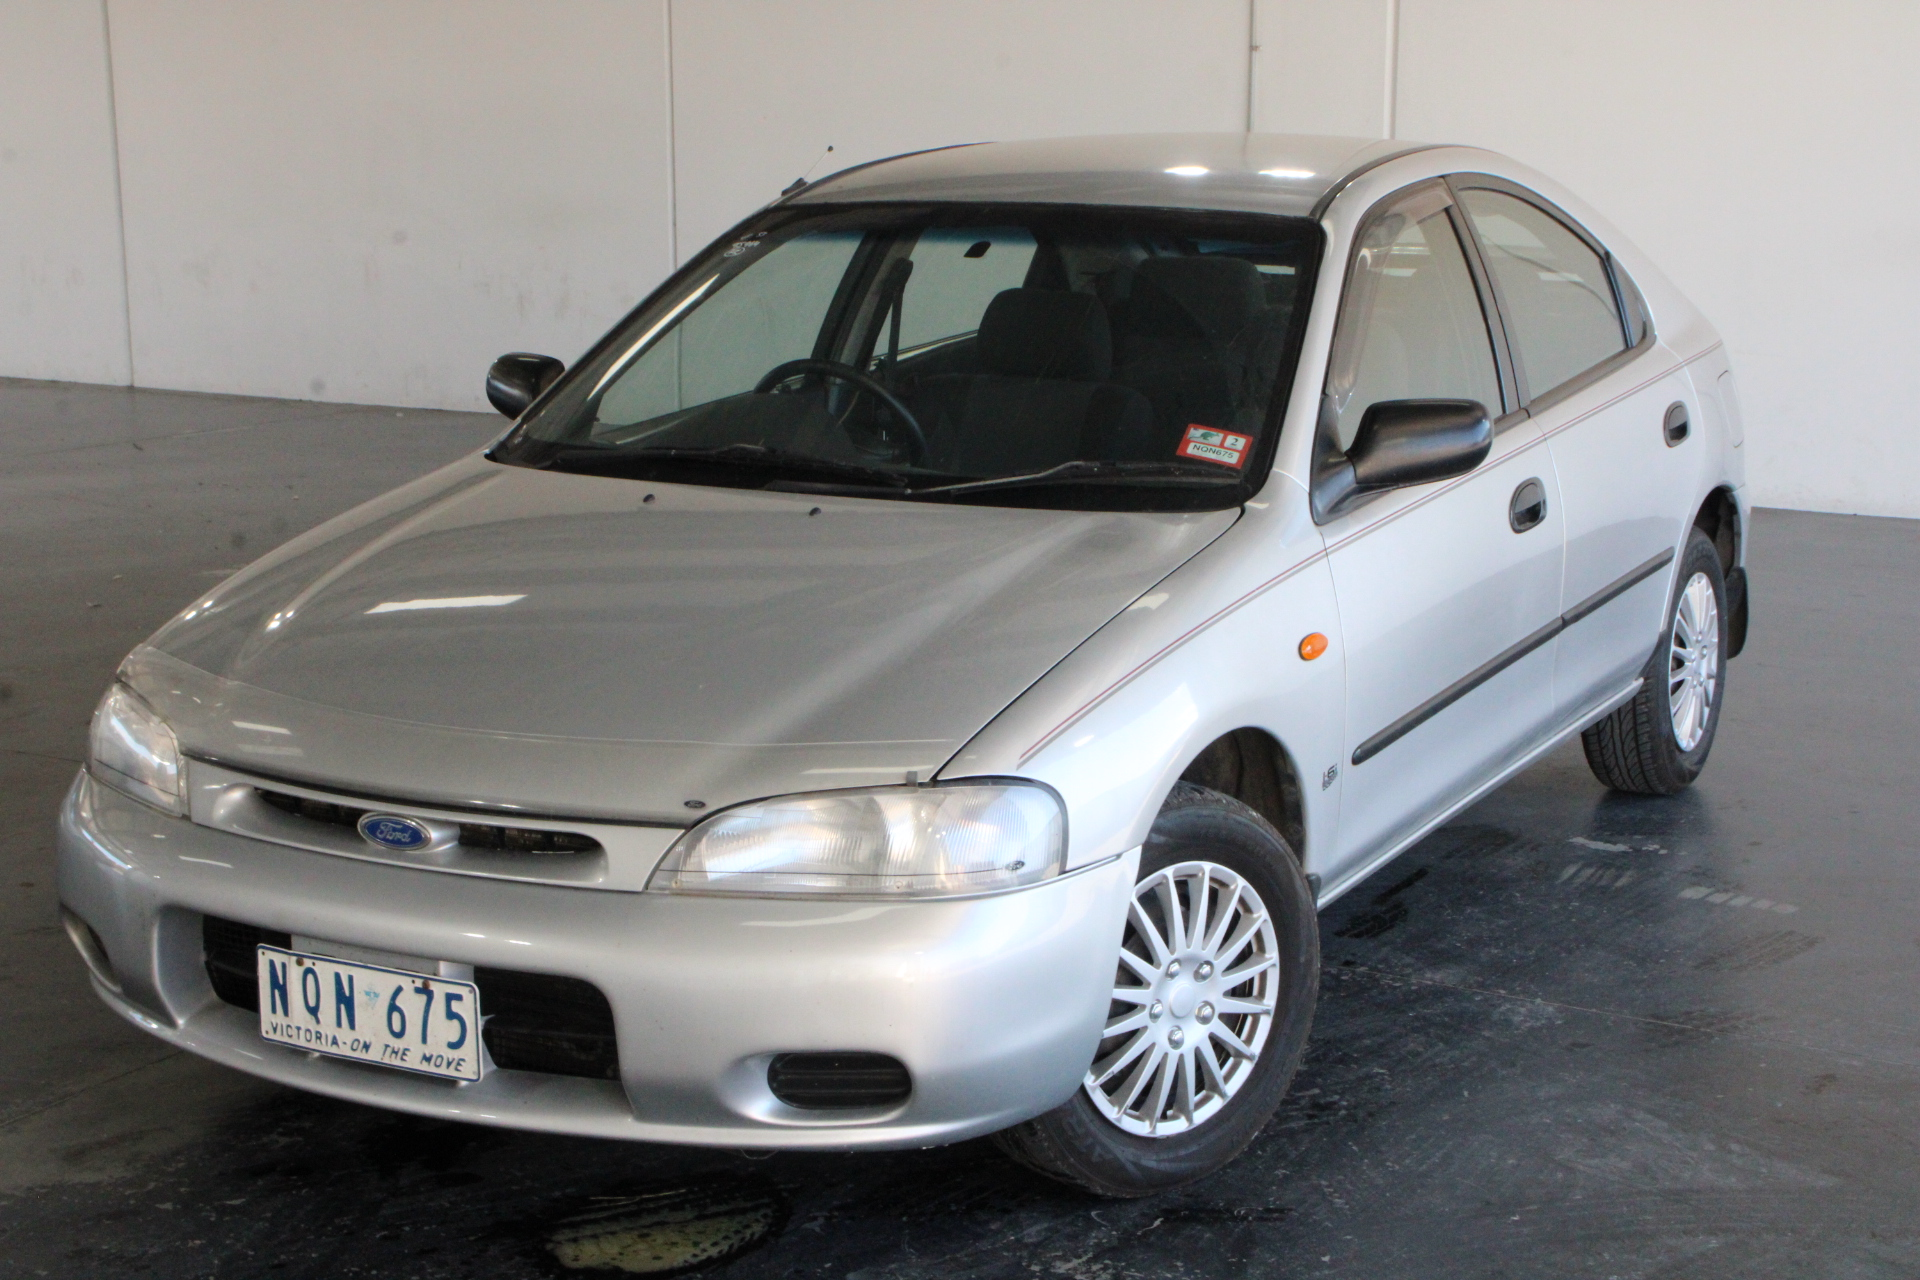 1996 Ford Laser LXi LIATA KJ Automatic Hatchback